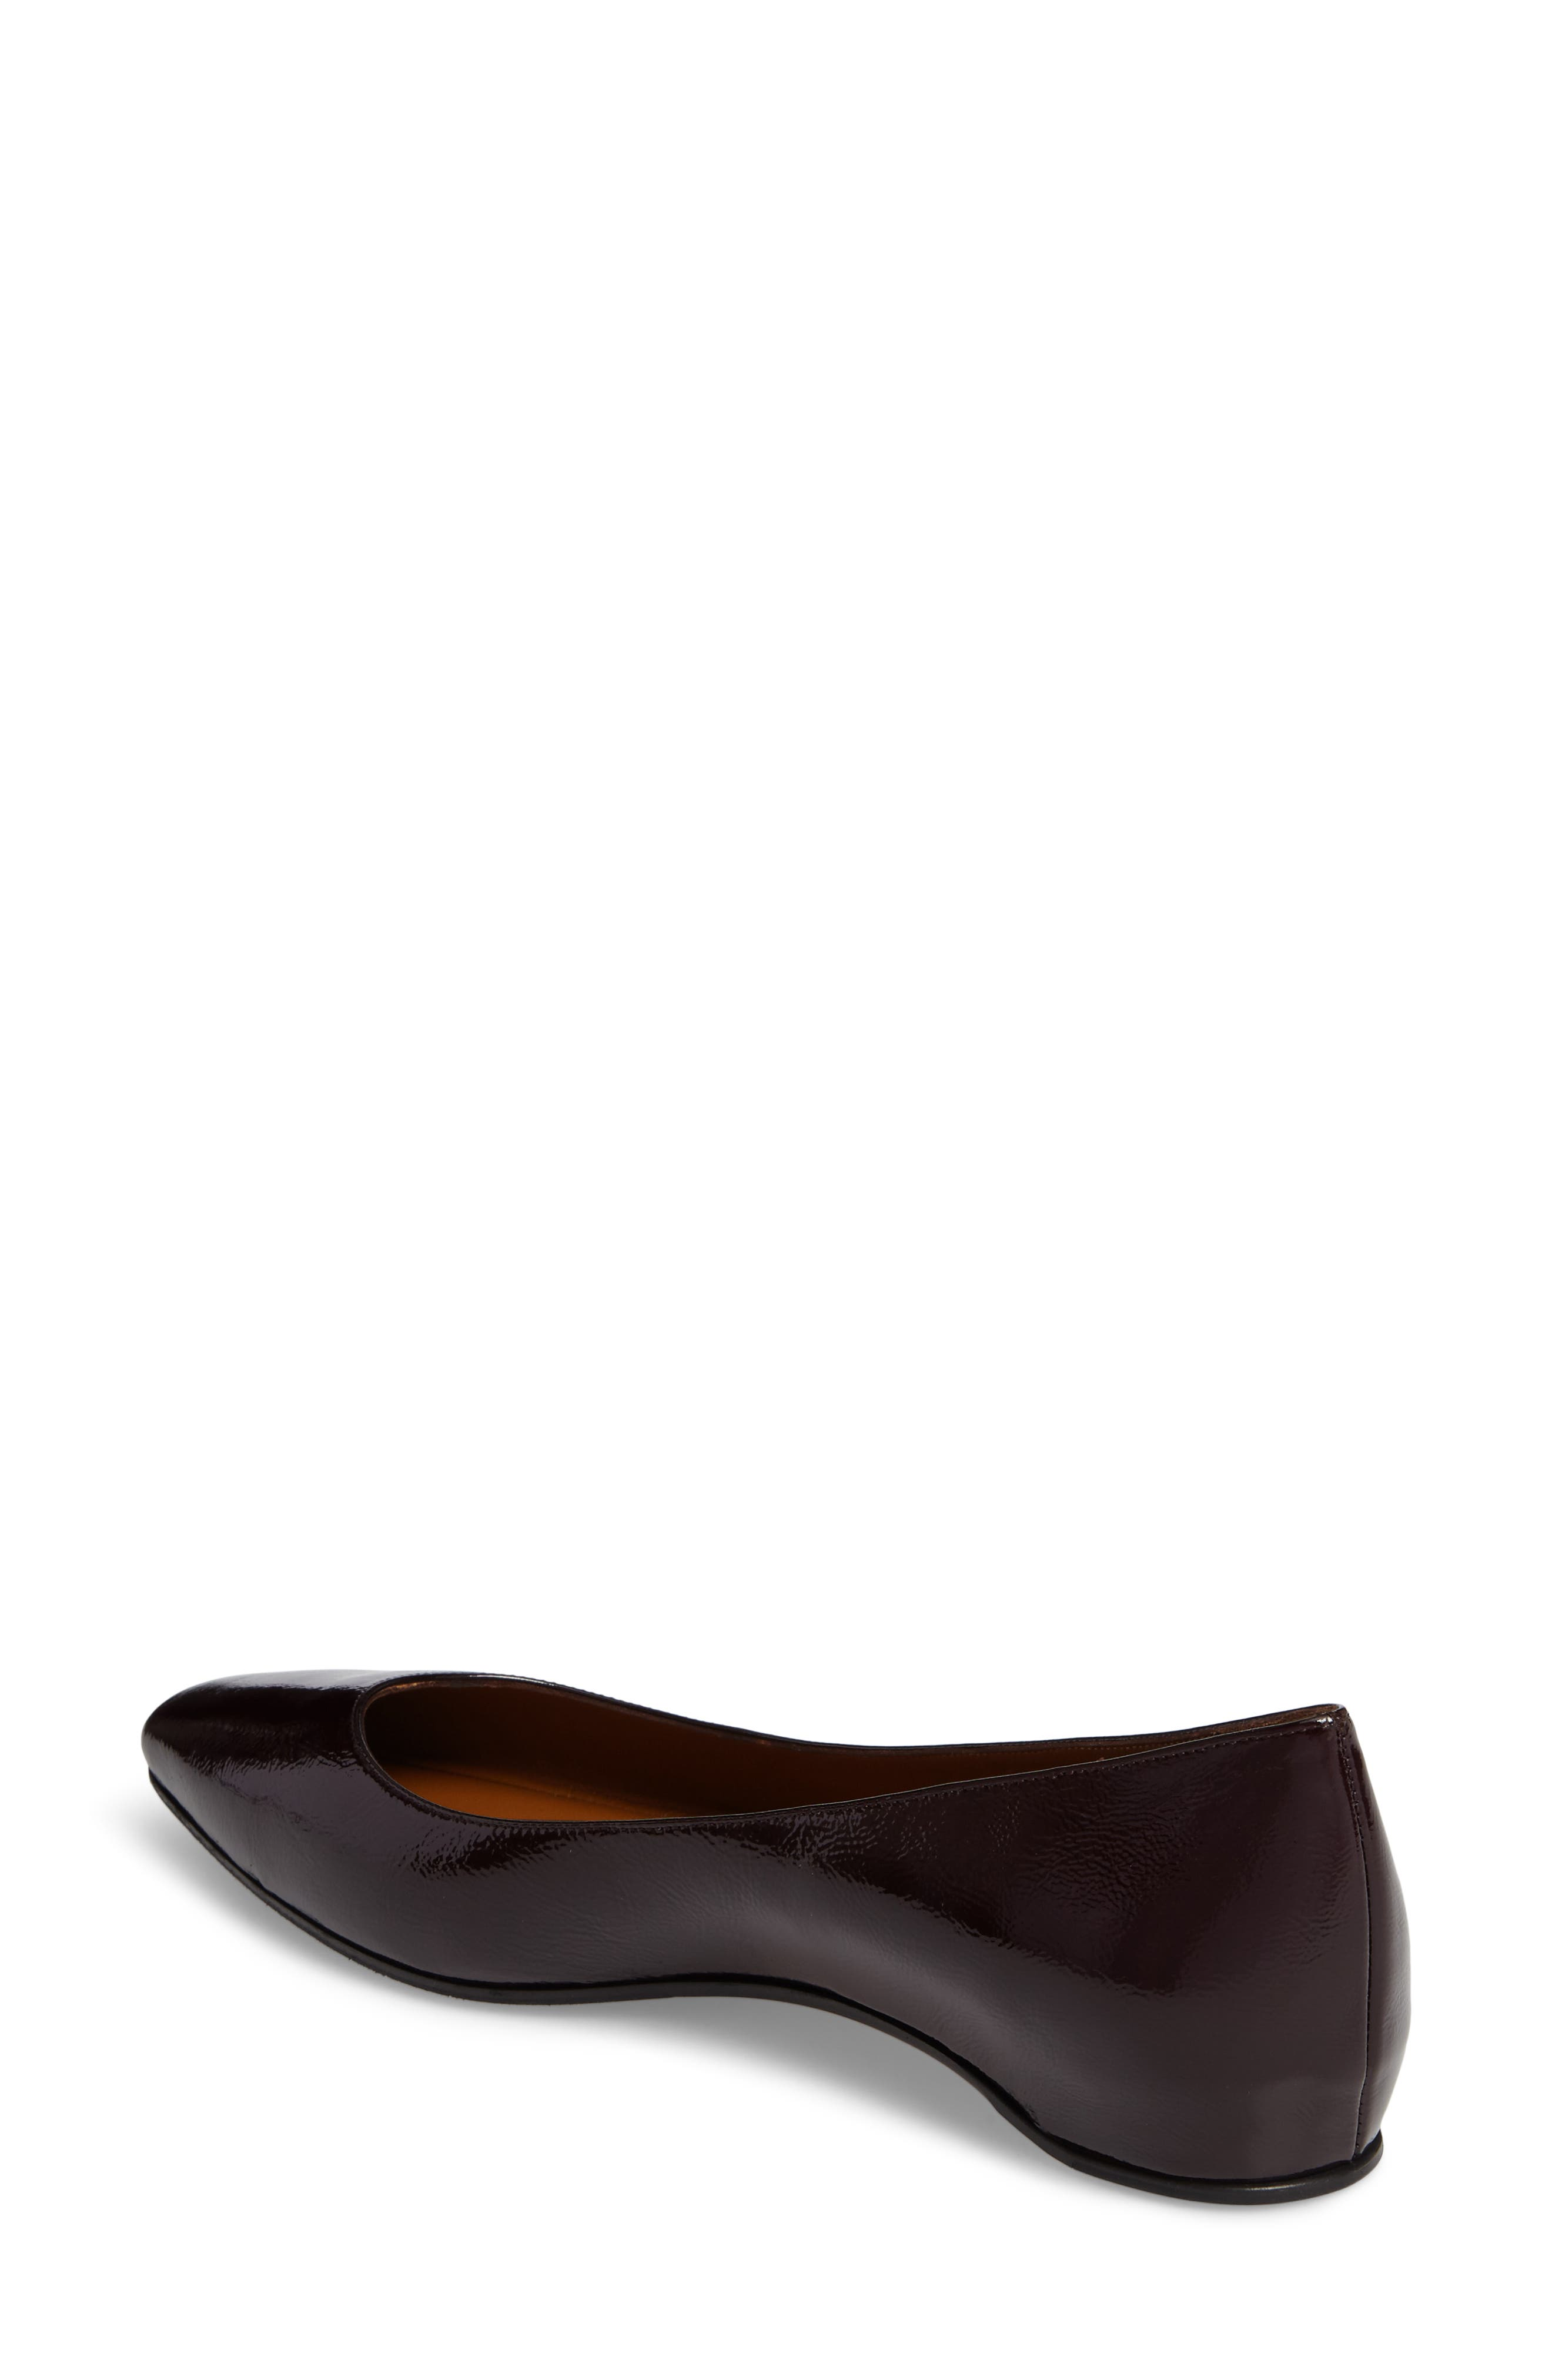 Marcella Weatherproof Leather Flat,                             Alternate thumbnail 2, color,                             Wine